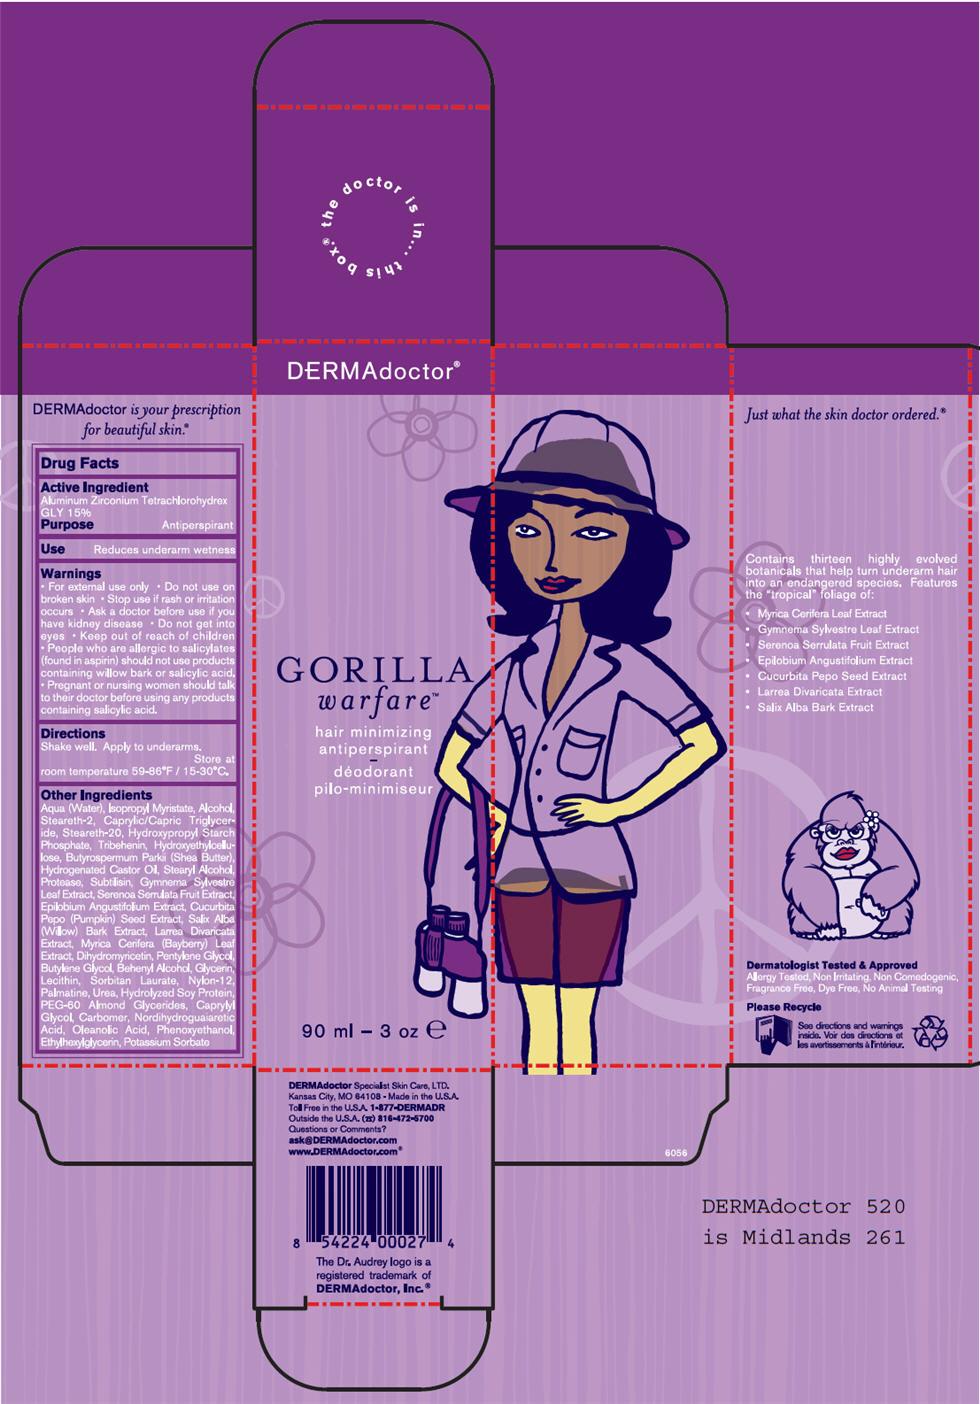 Gorilla Warfare (Aluminum Zirconium Tetrachlorohydrex Gly) Lotion [G.s. Cosmeceutical Usa, Inc.]